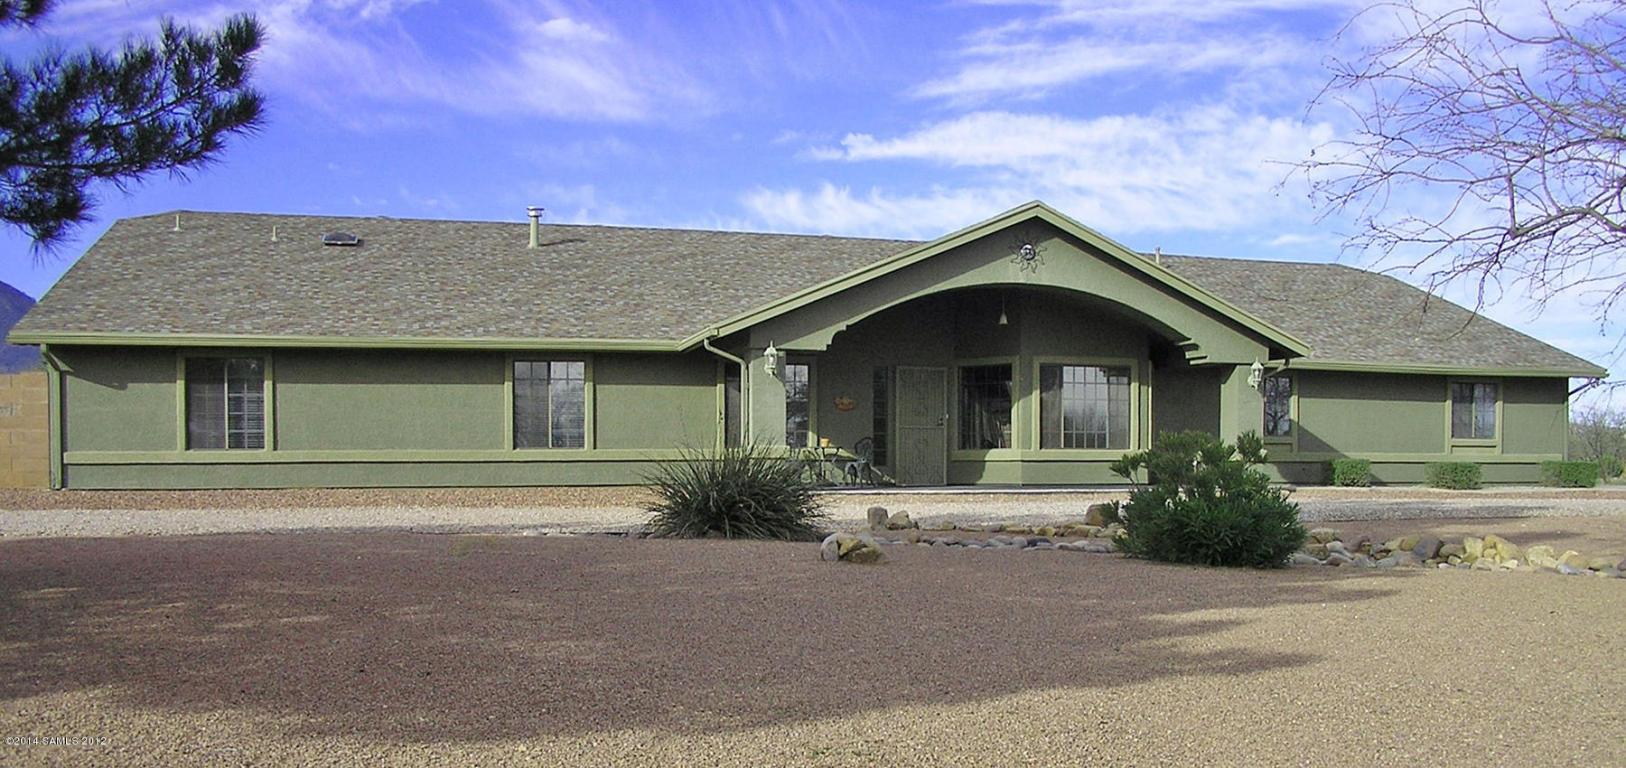 Real Estate for Sale, ListingId: 31829923, Sierra Vista,AZ85650